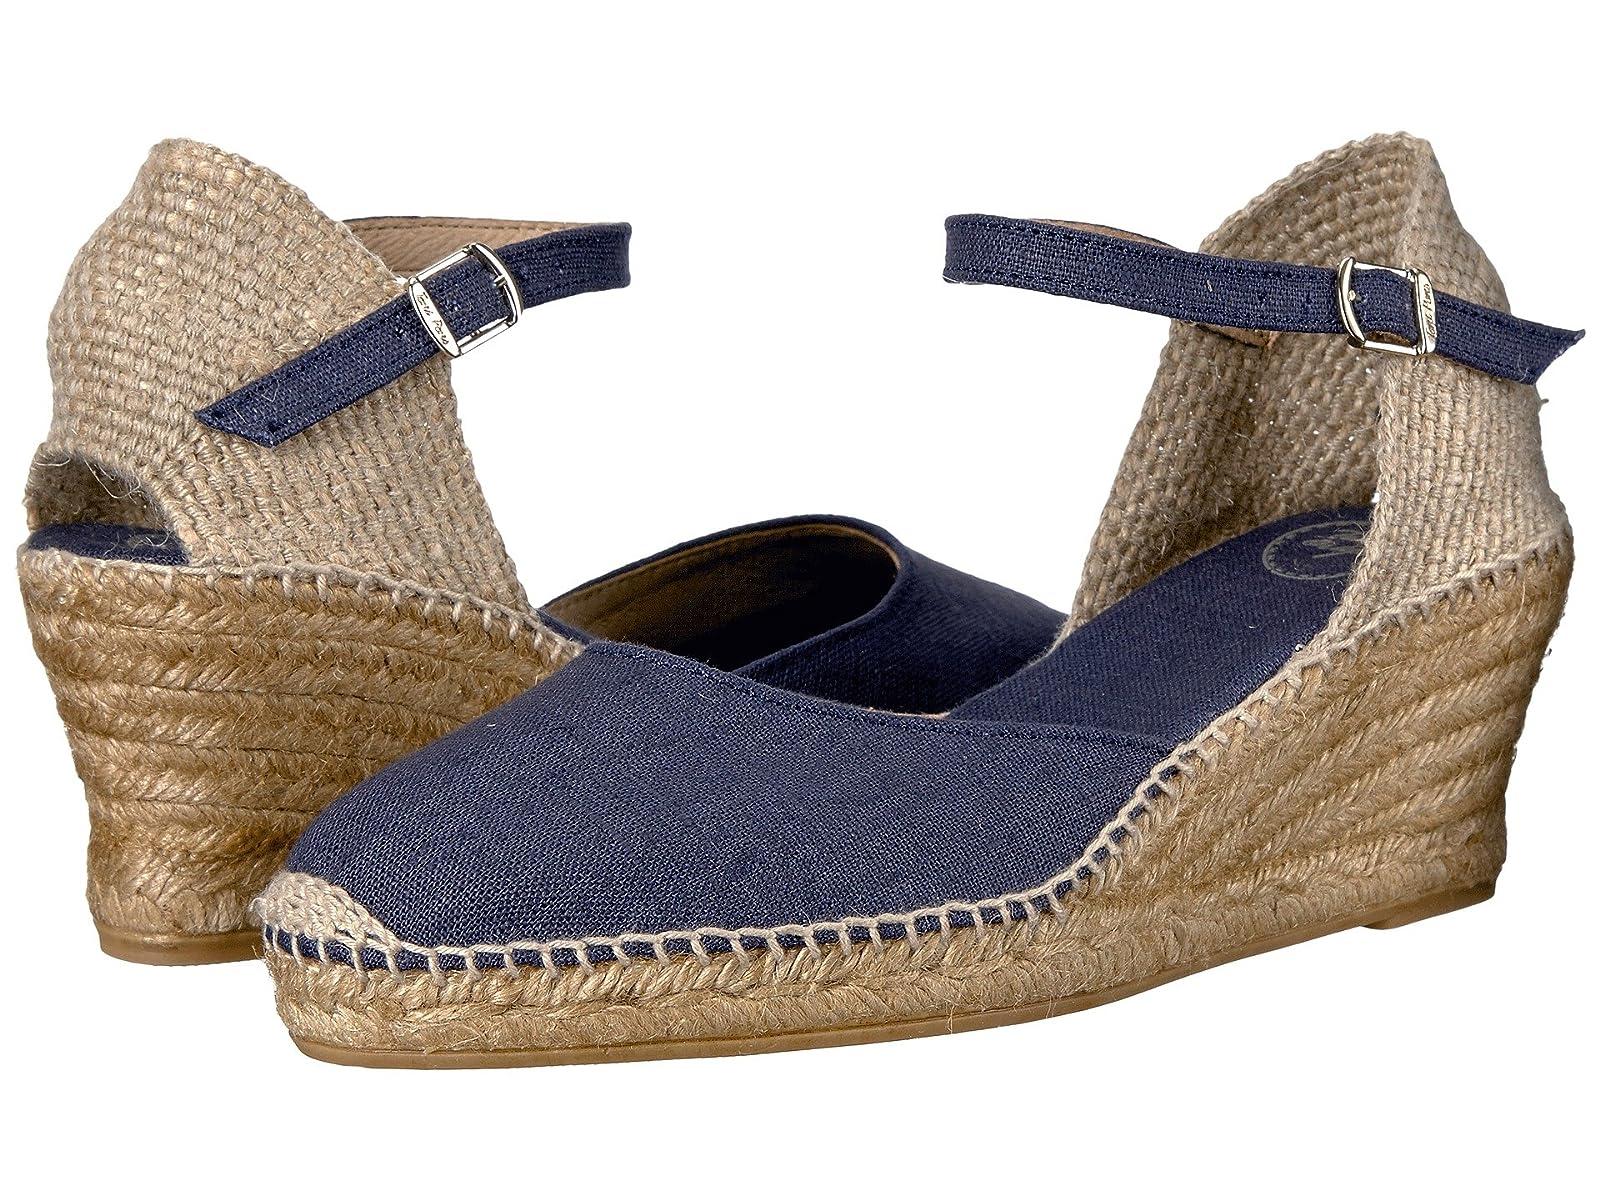 Toni Pons CaldesAtmospheric grades have affordable shoes